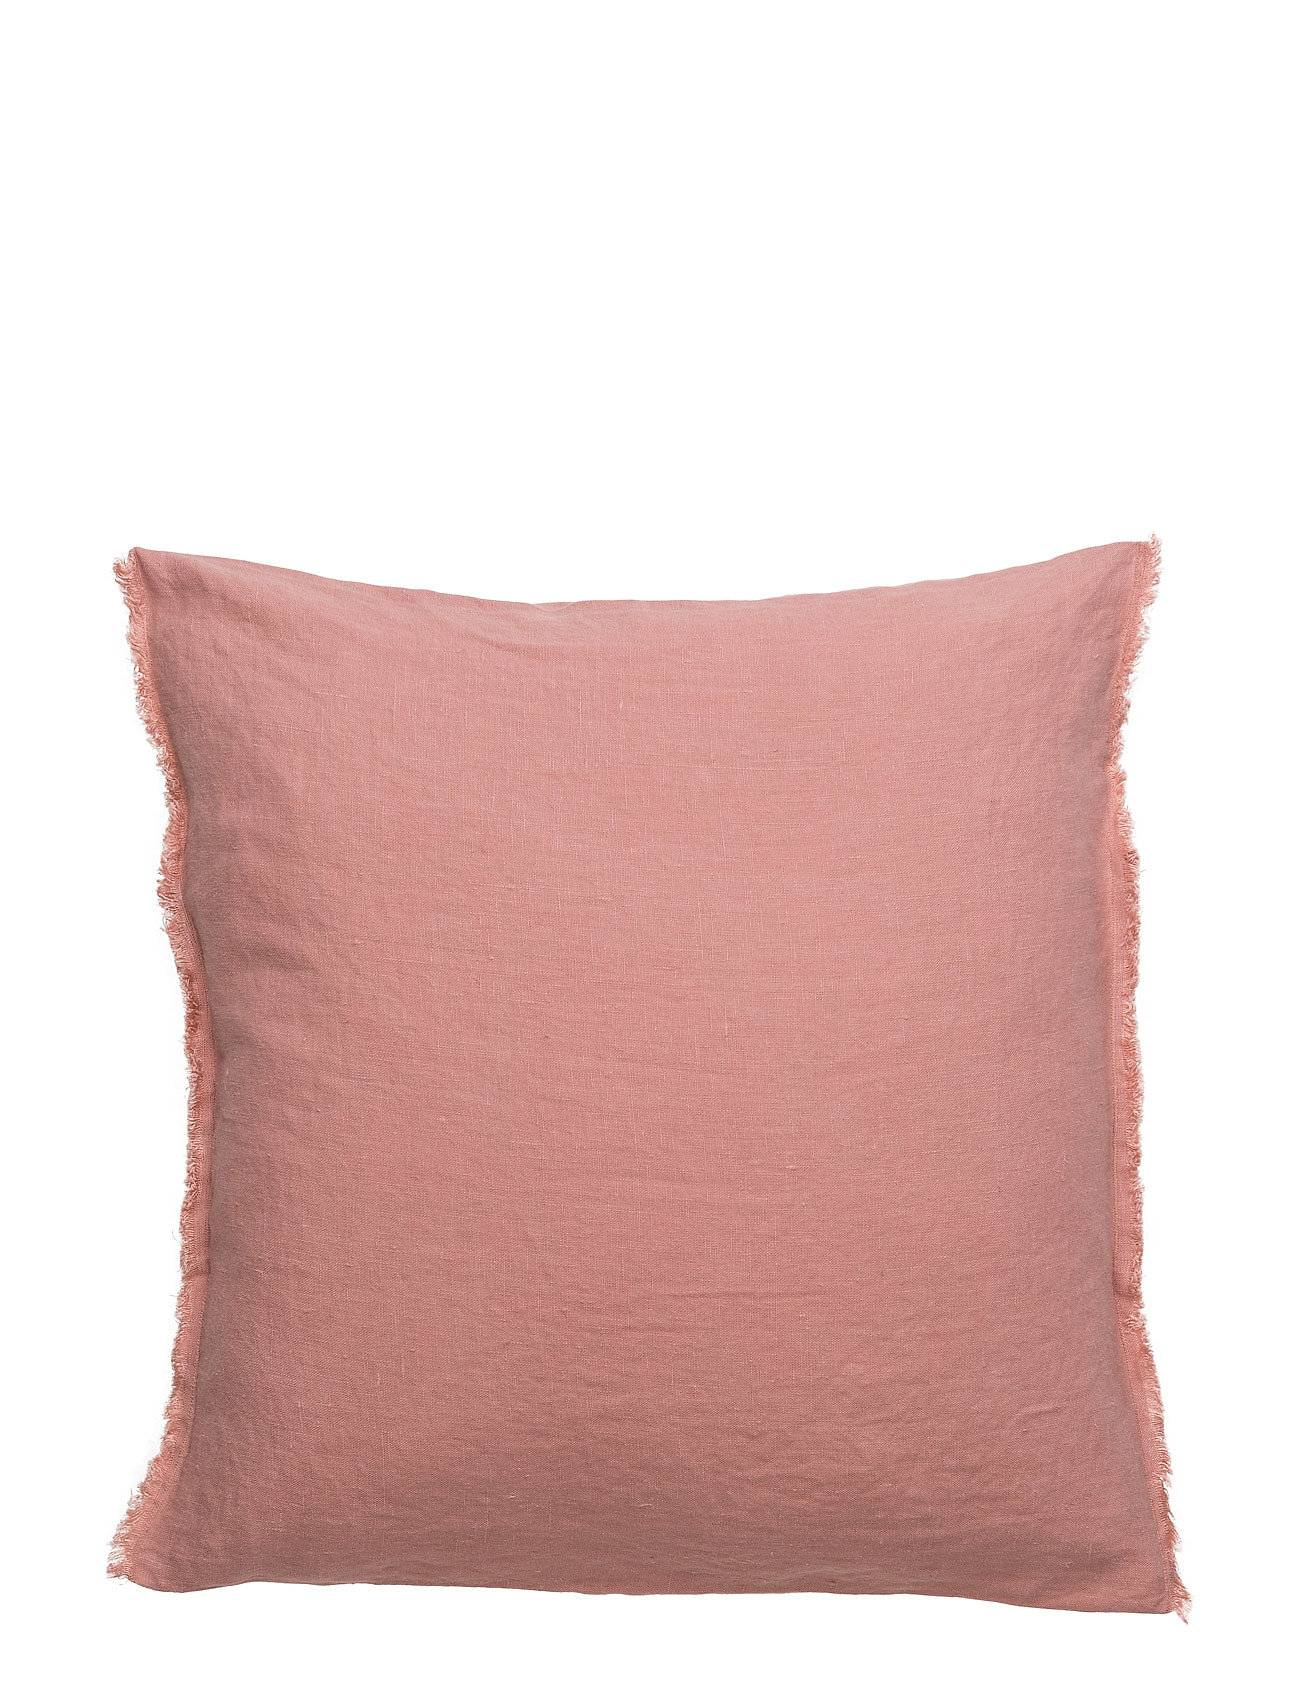 Himla Sunshine Fringe Cushion Home Living Room Cushion Vaaleanpunainen Himla